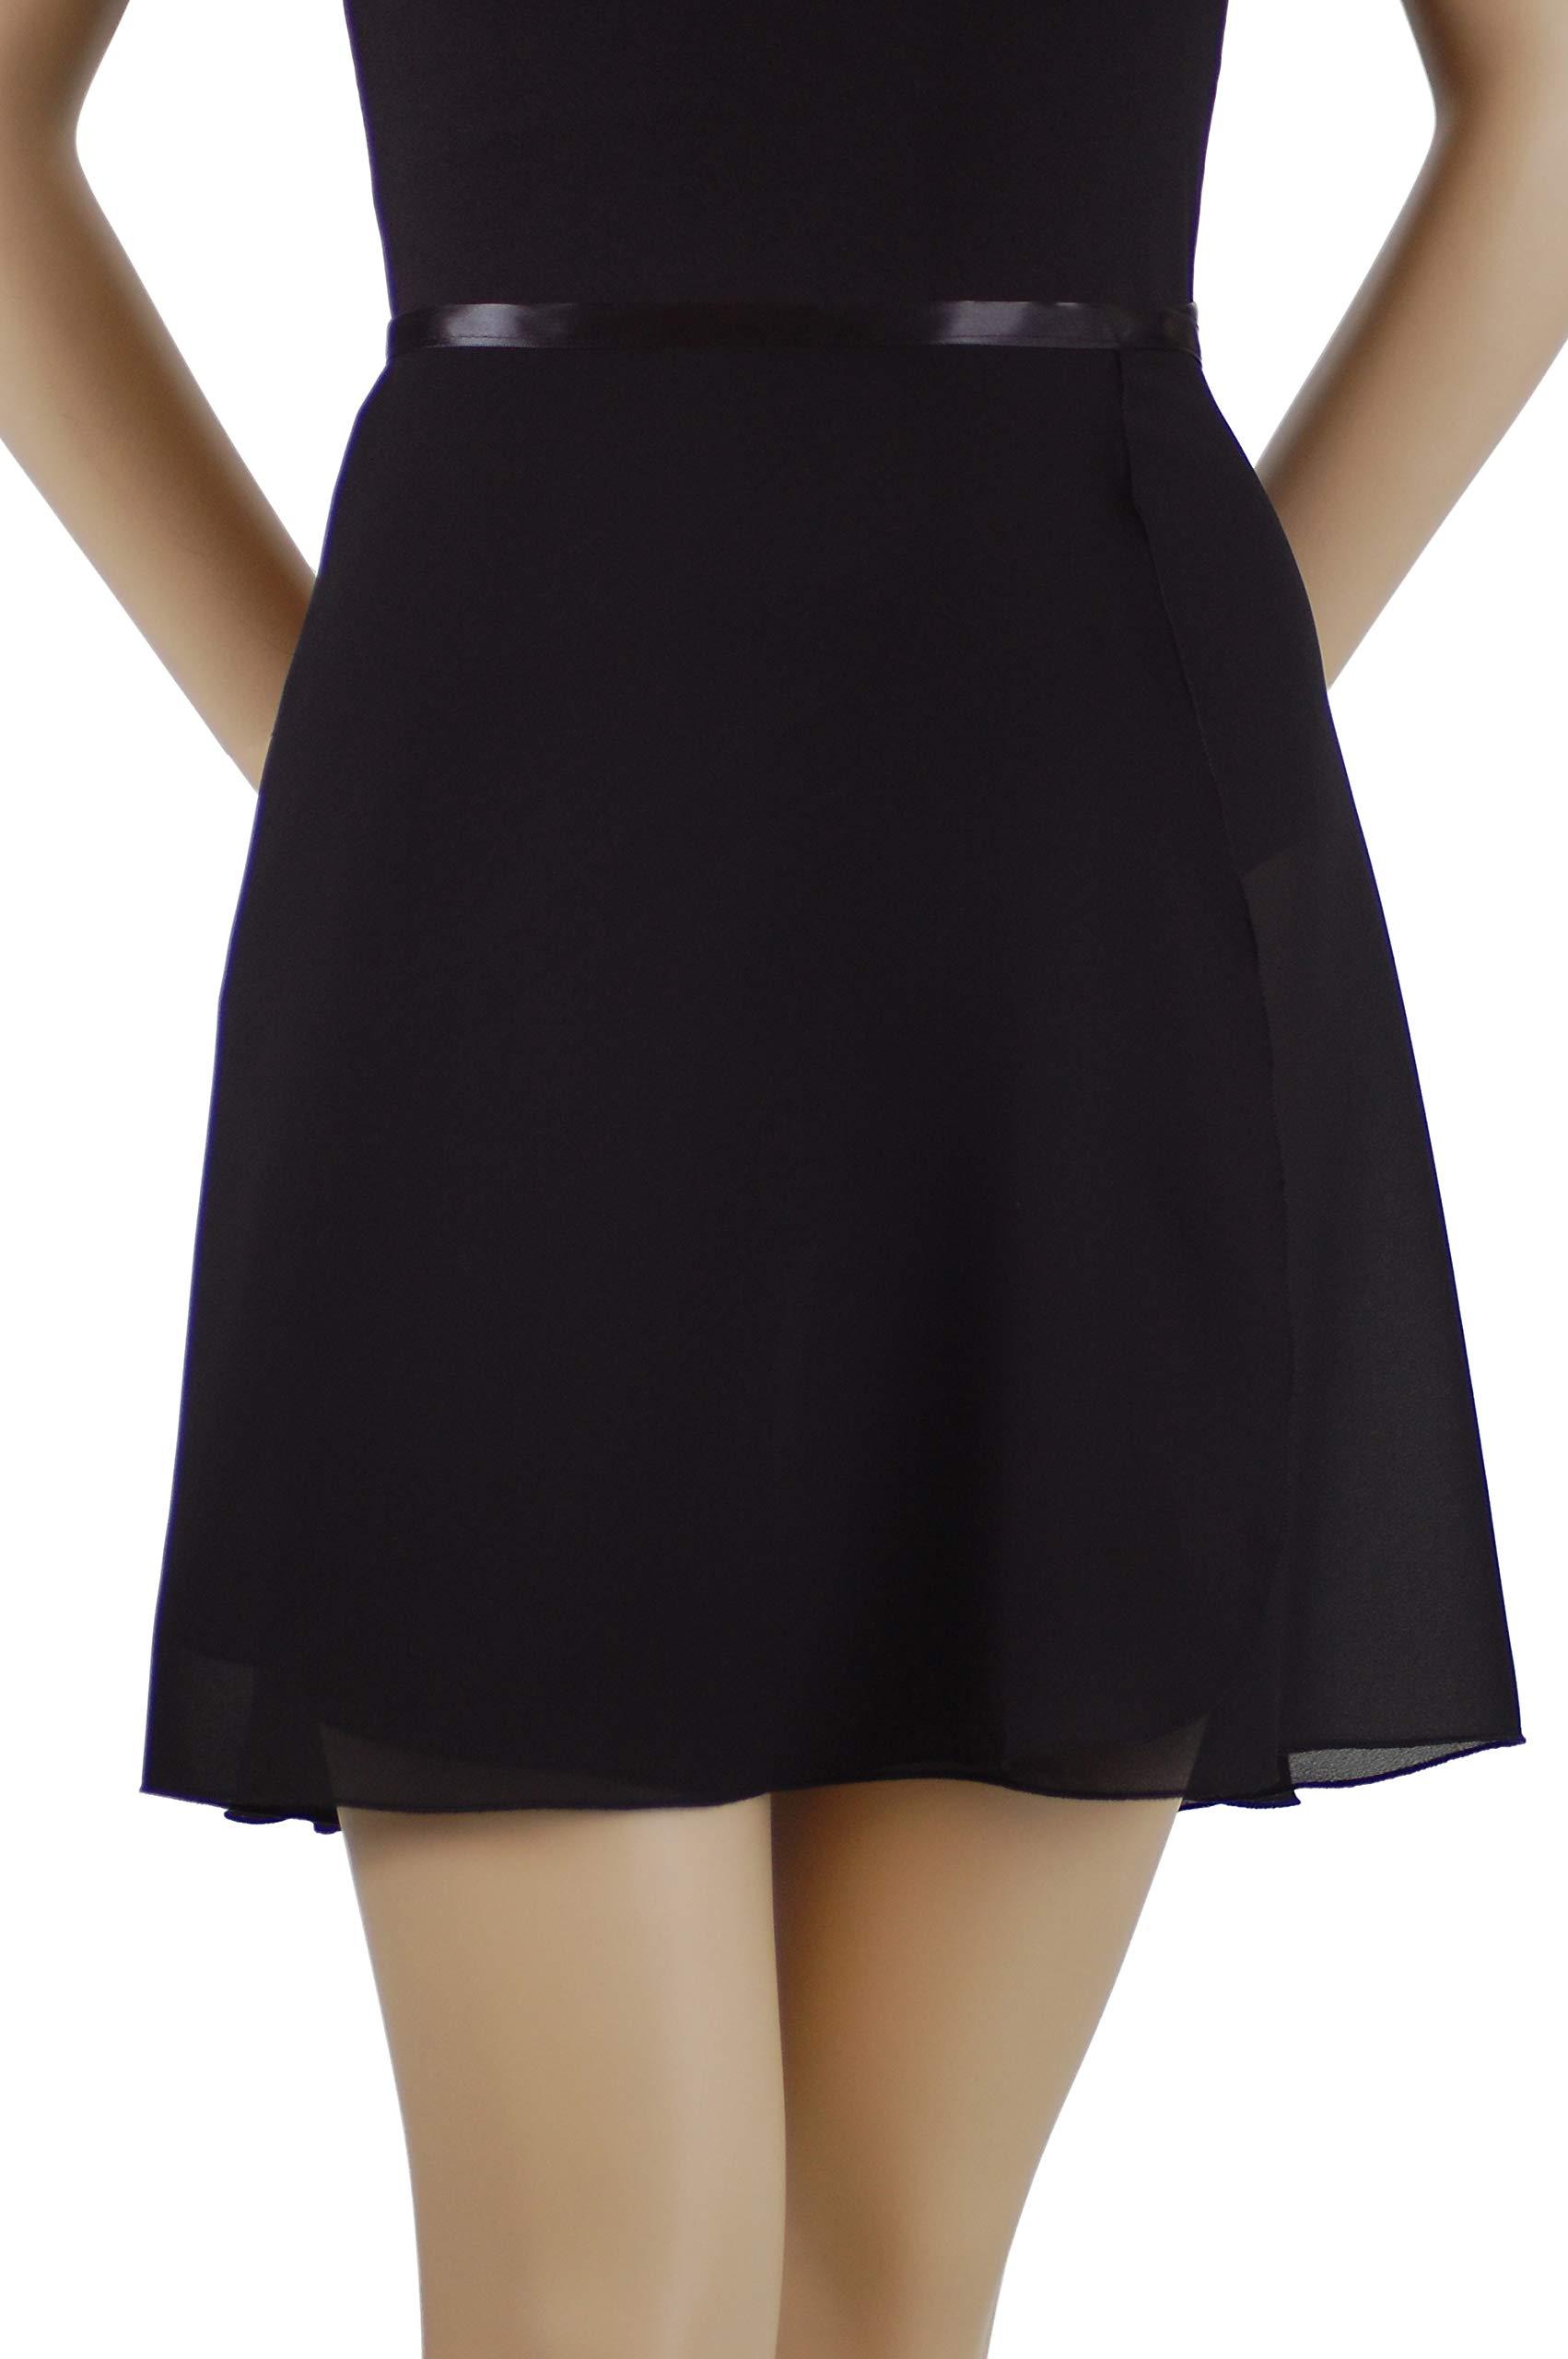 aeff588cd Trienawear Womens Ballet Skirt, 16